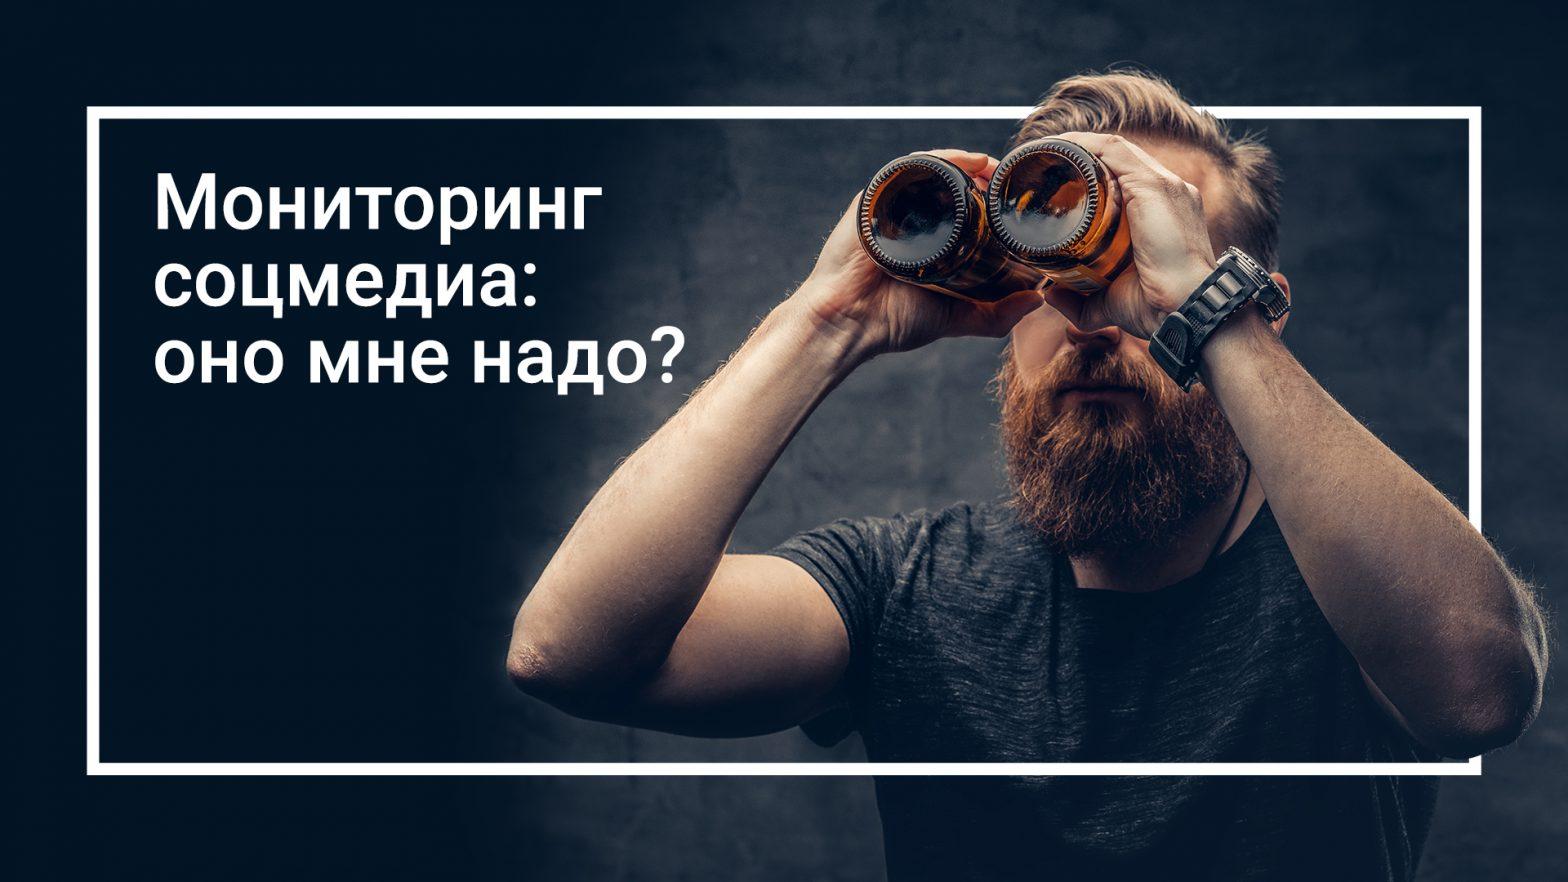 Мониторинг соцмедиа: оно мне надо?